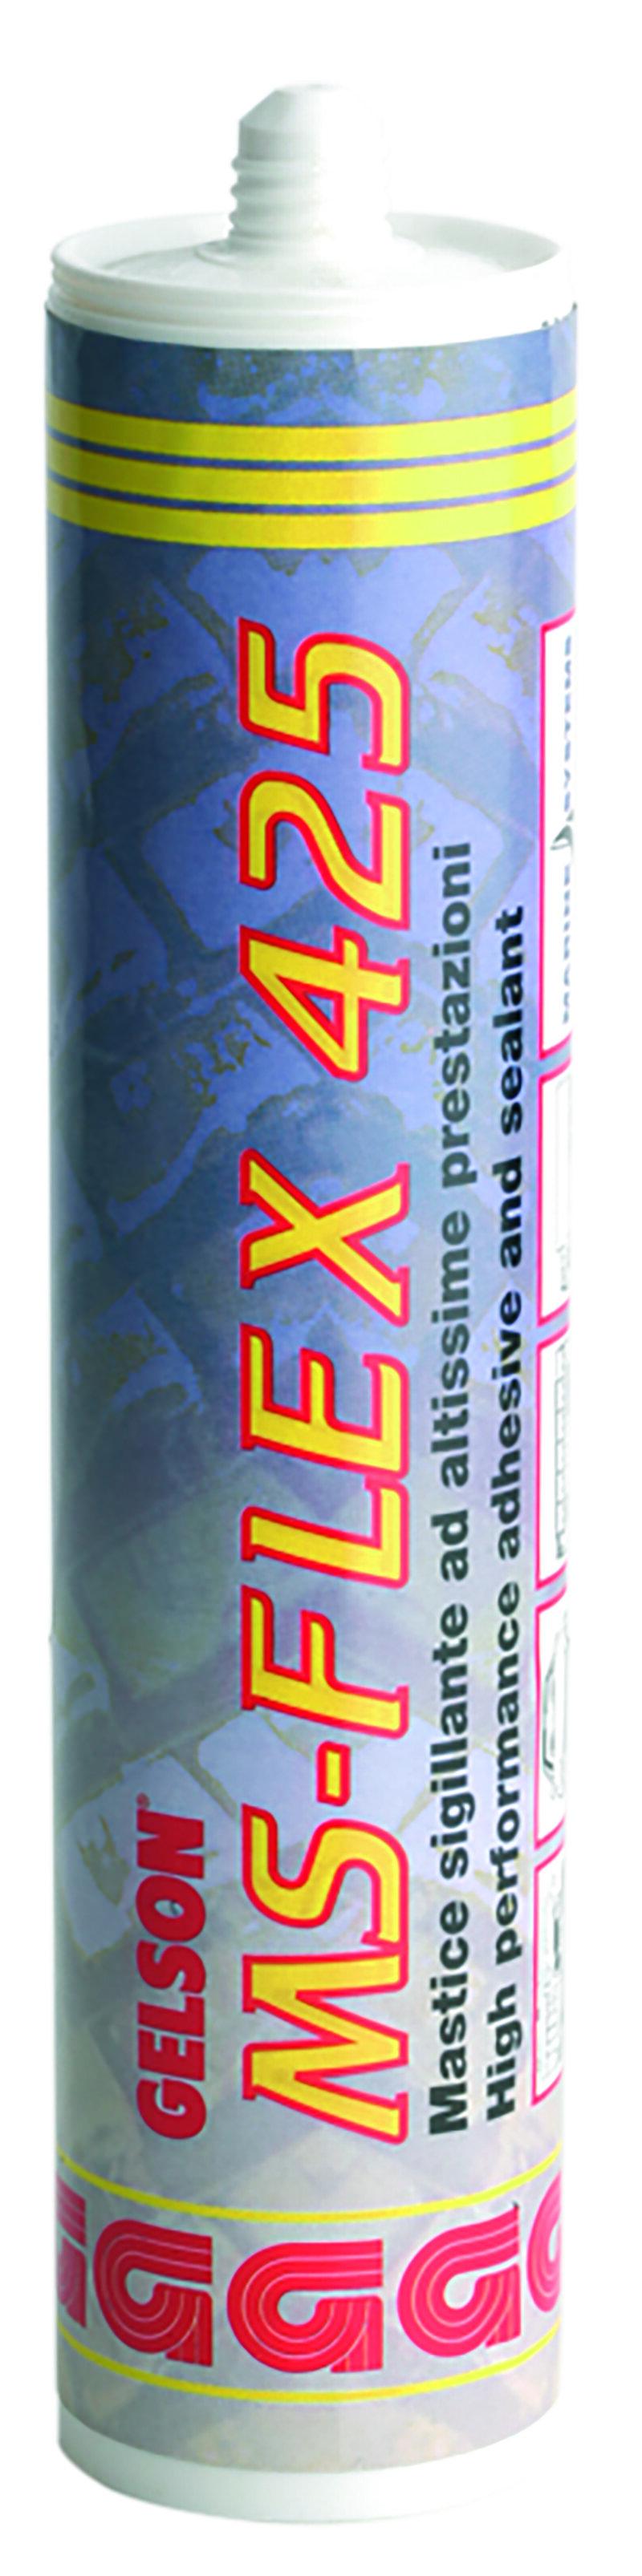 MS-FLEX 425 BIANCO CART.310 CC